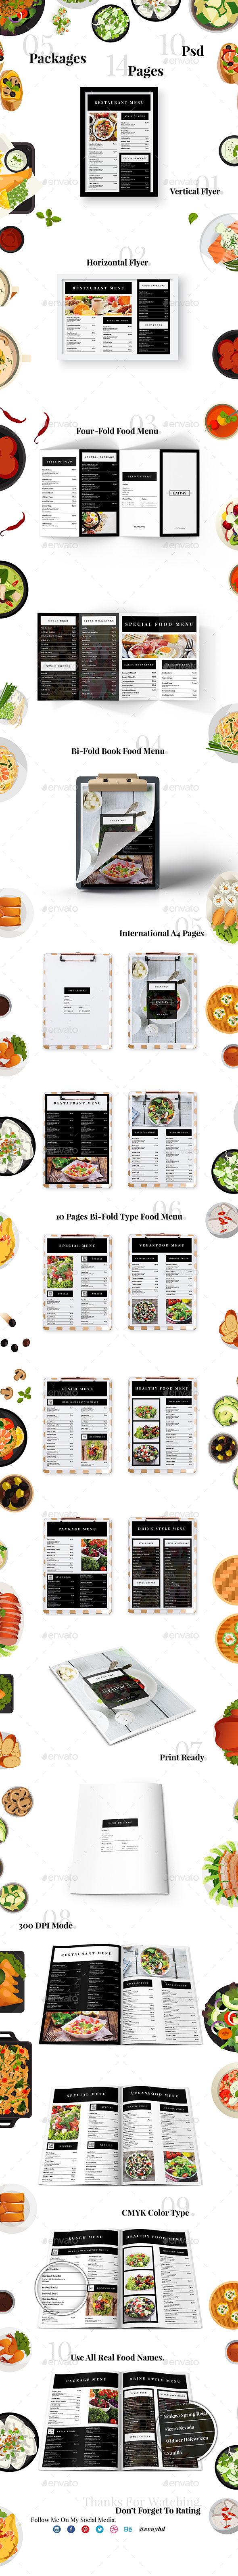 Minimalism Food Menu Pack - Food Menus Print Templates